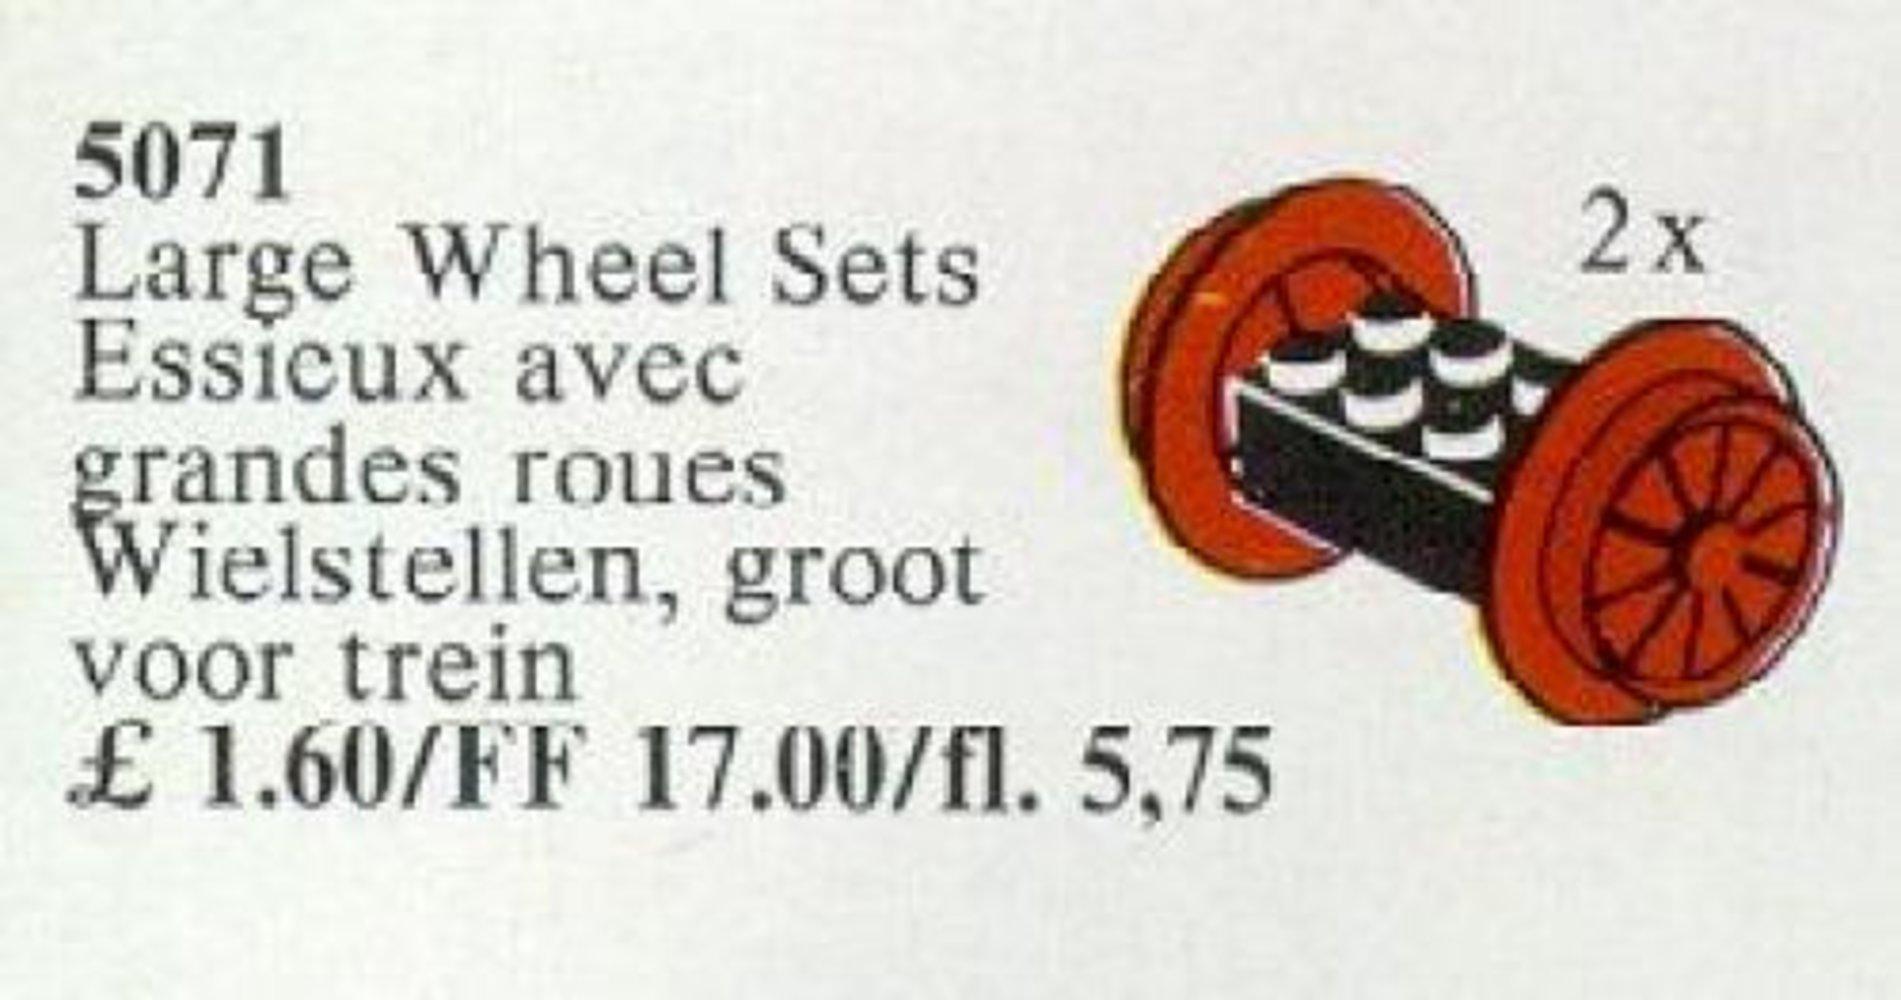 Wheel Sets, Large, Red